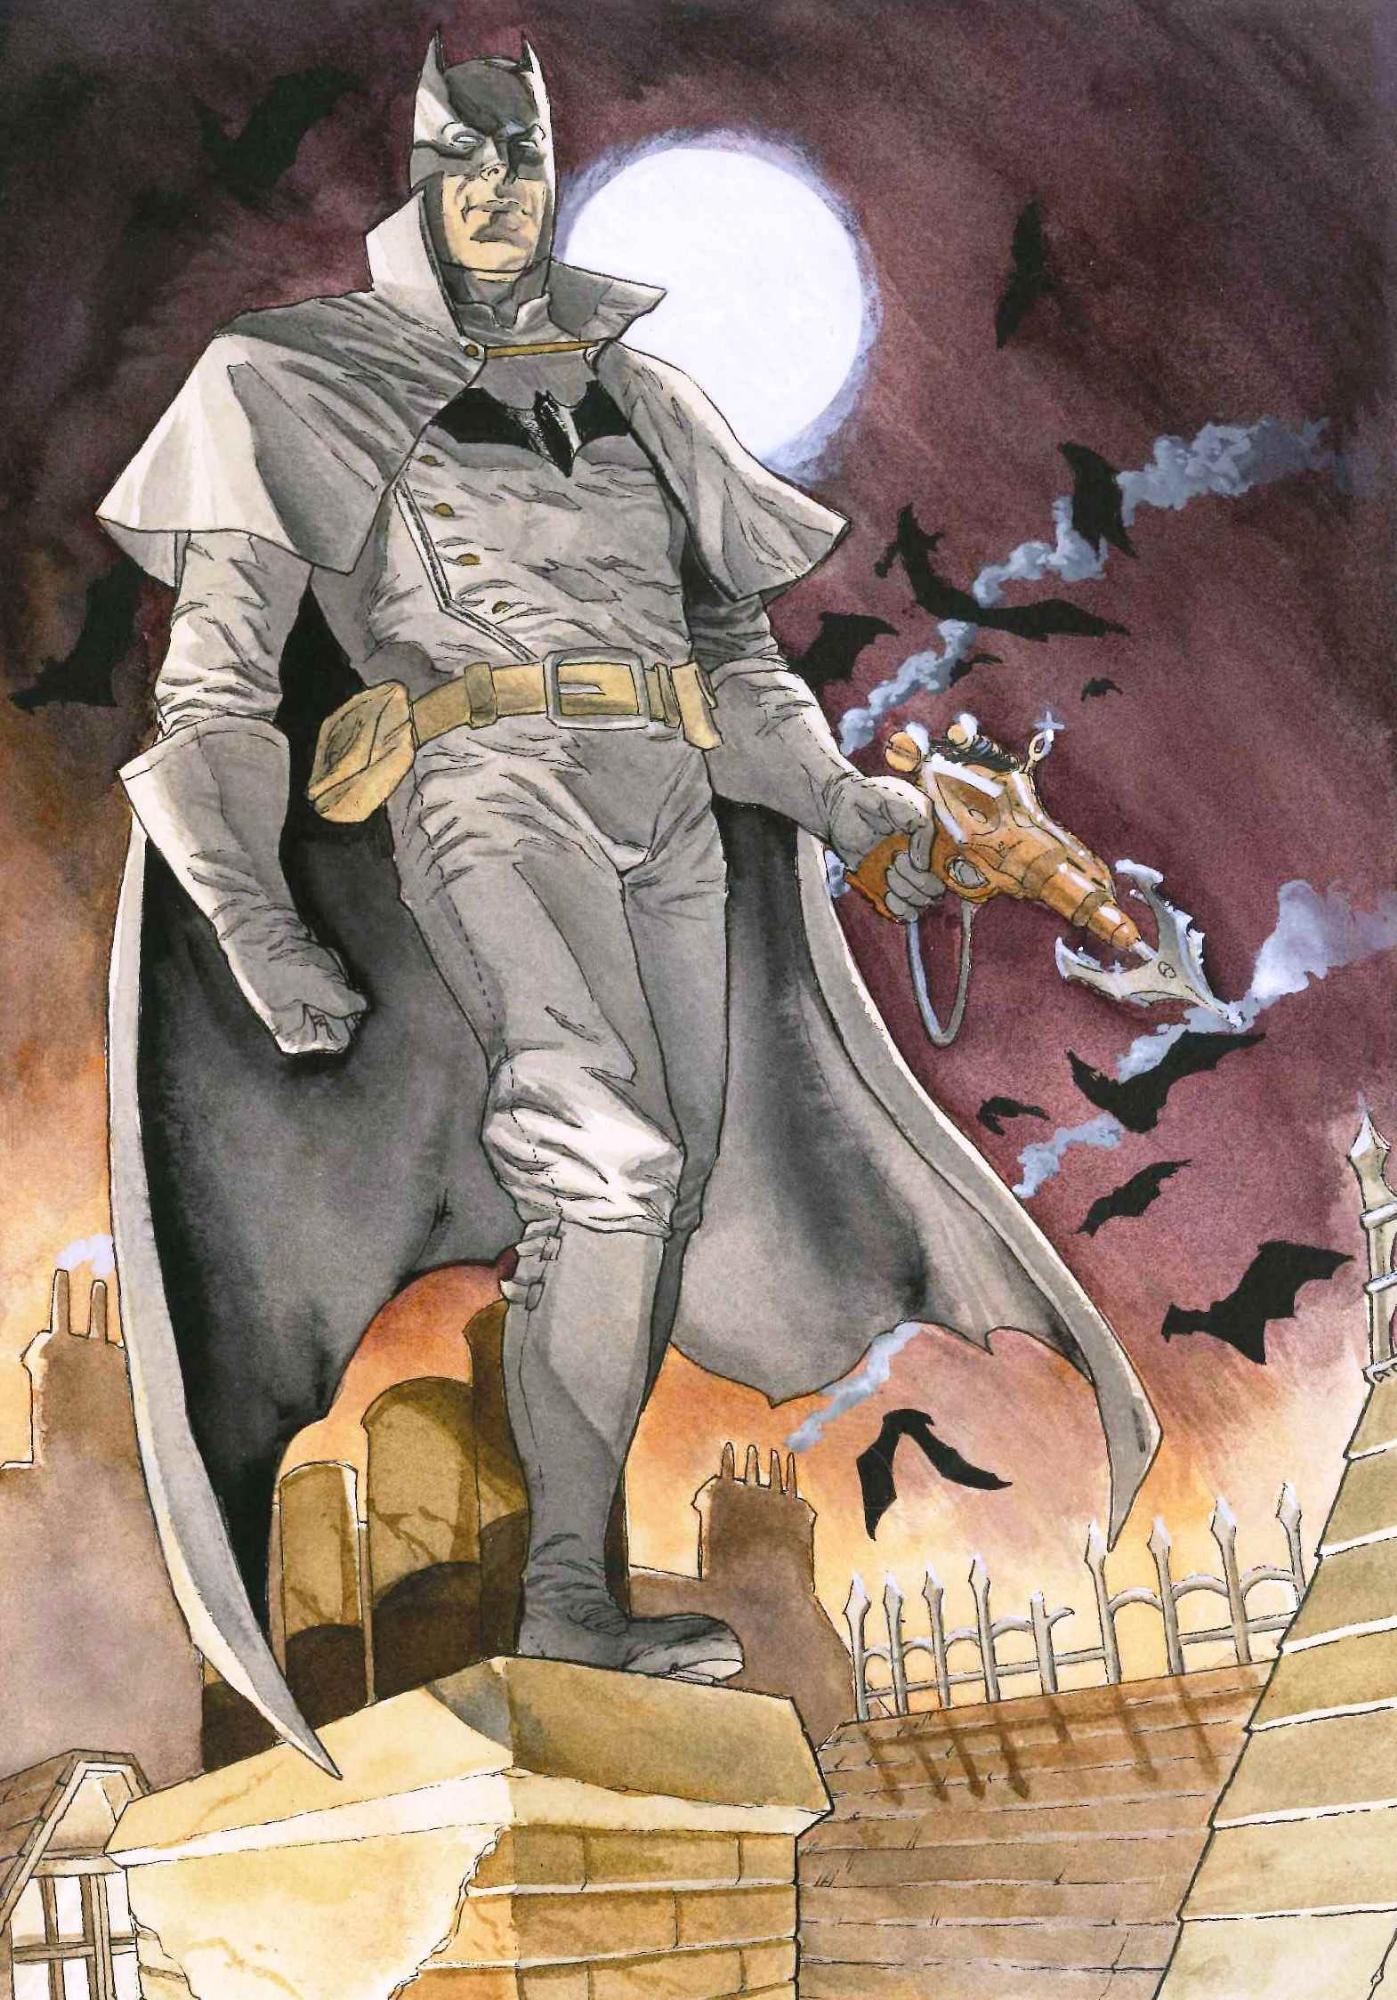 Batman Gotham By Gaslight In Erfauki D S For Sale Miscelanea Comic Art Gallery Room